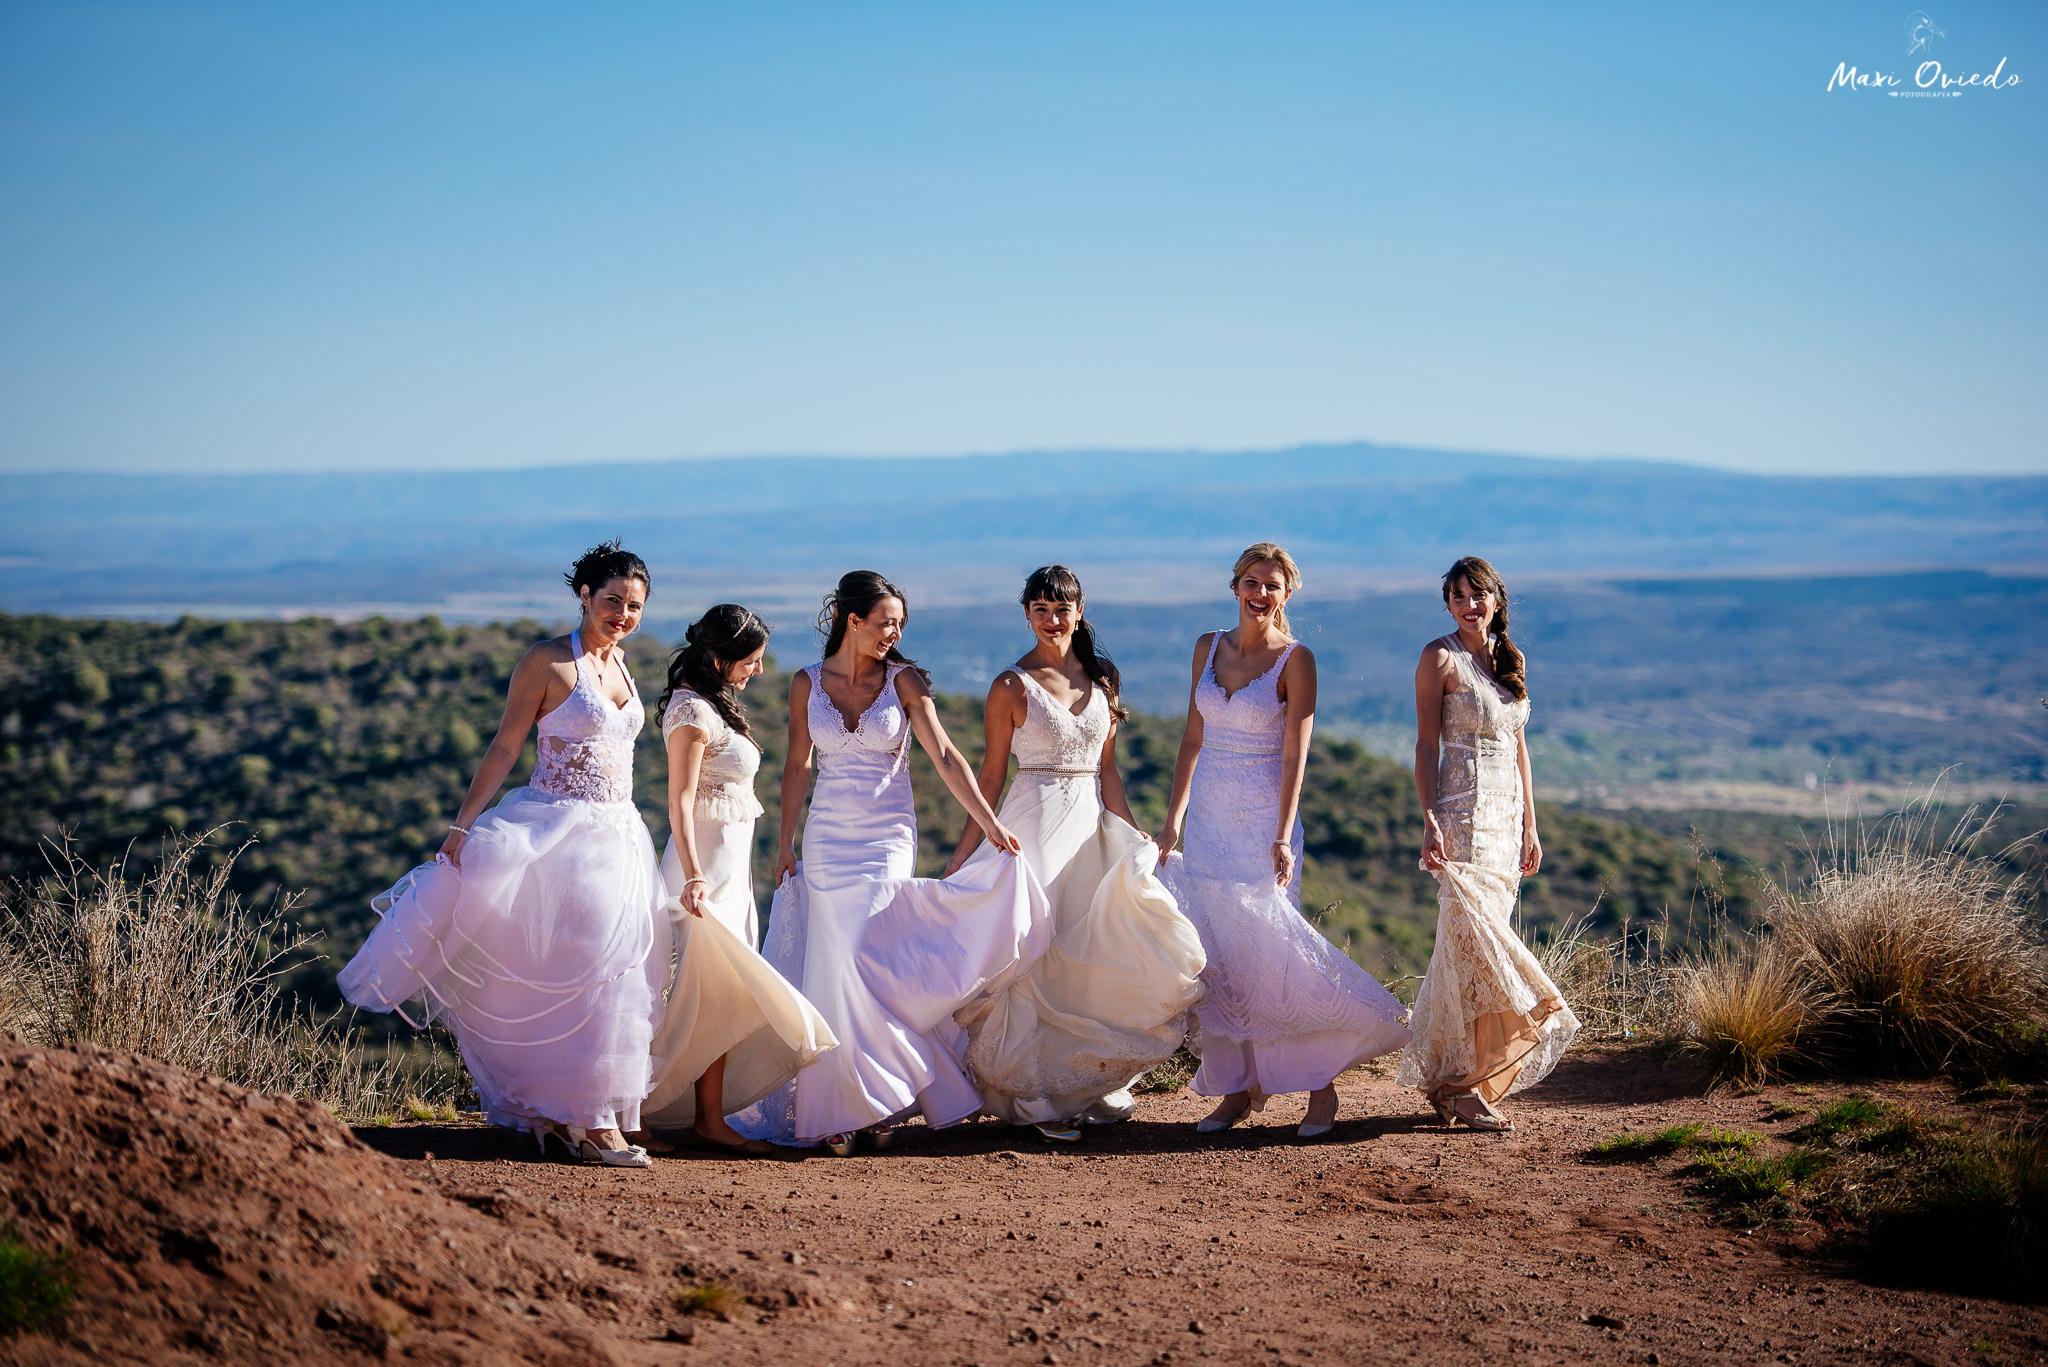 boda sextuple la cumbre cordoba cuchi corral fotografo de bodas fotografo de casamientos rosario san nicolas argentina vestido de novia ramo de novia-13.jpg